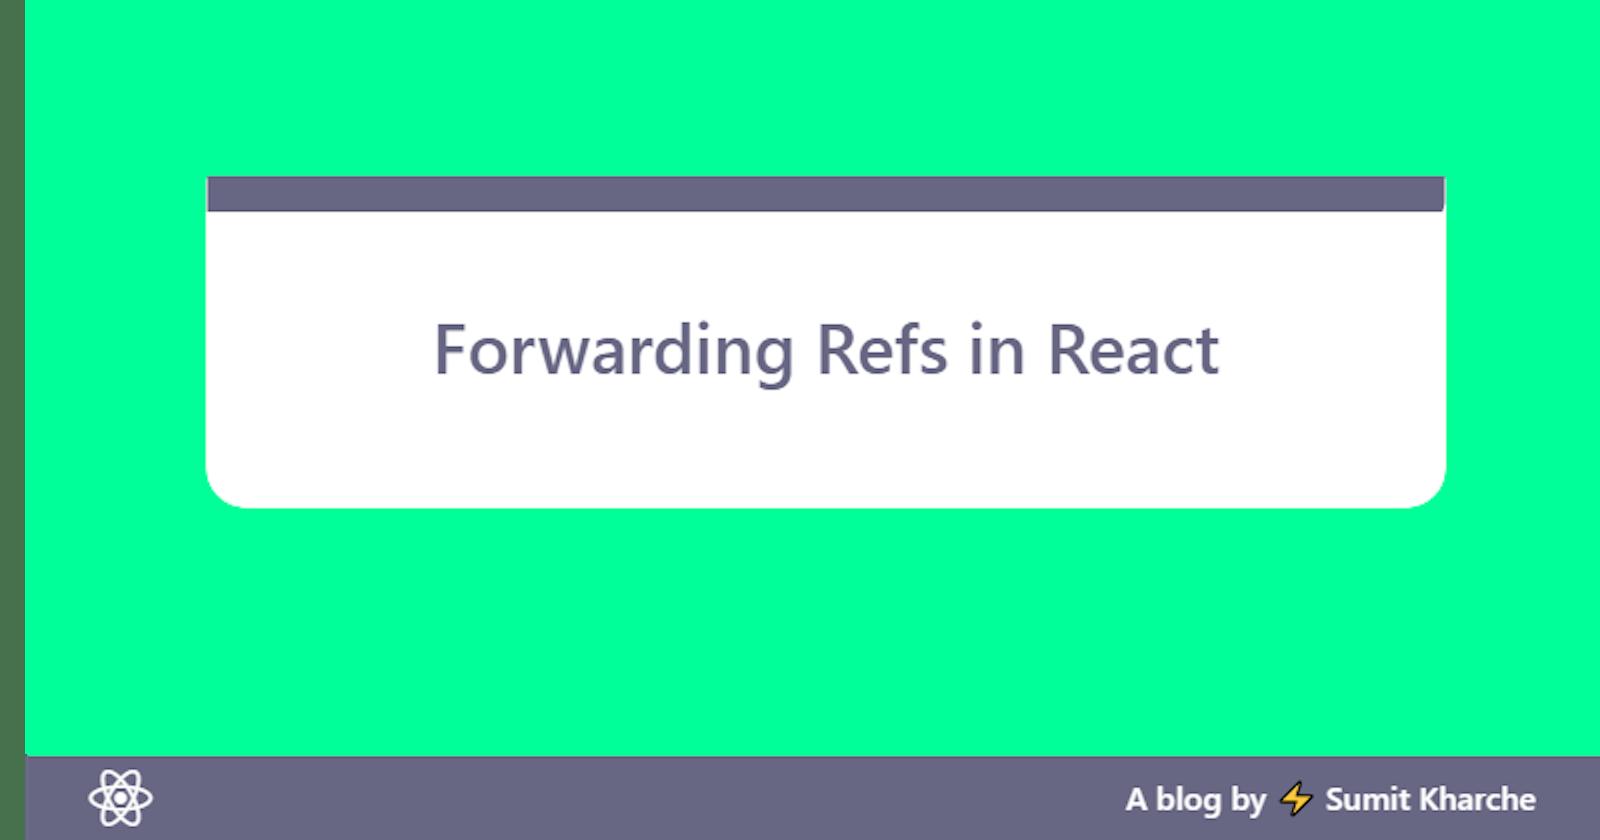 Forwarding Refs in React